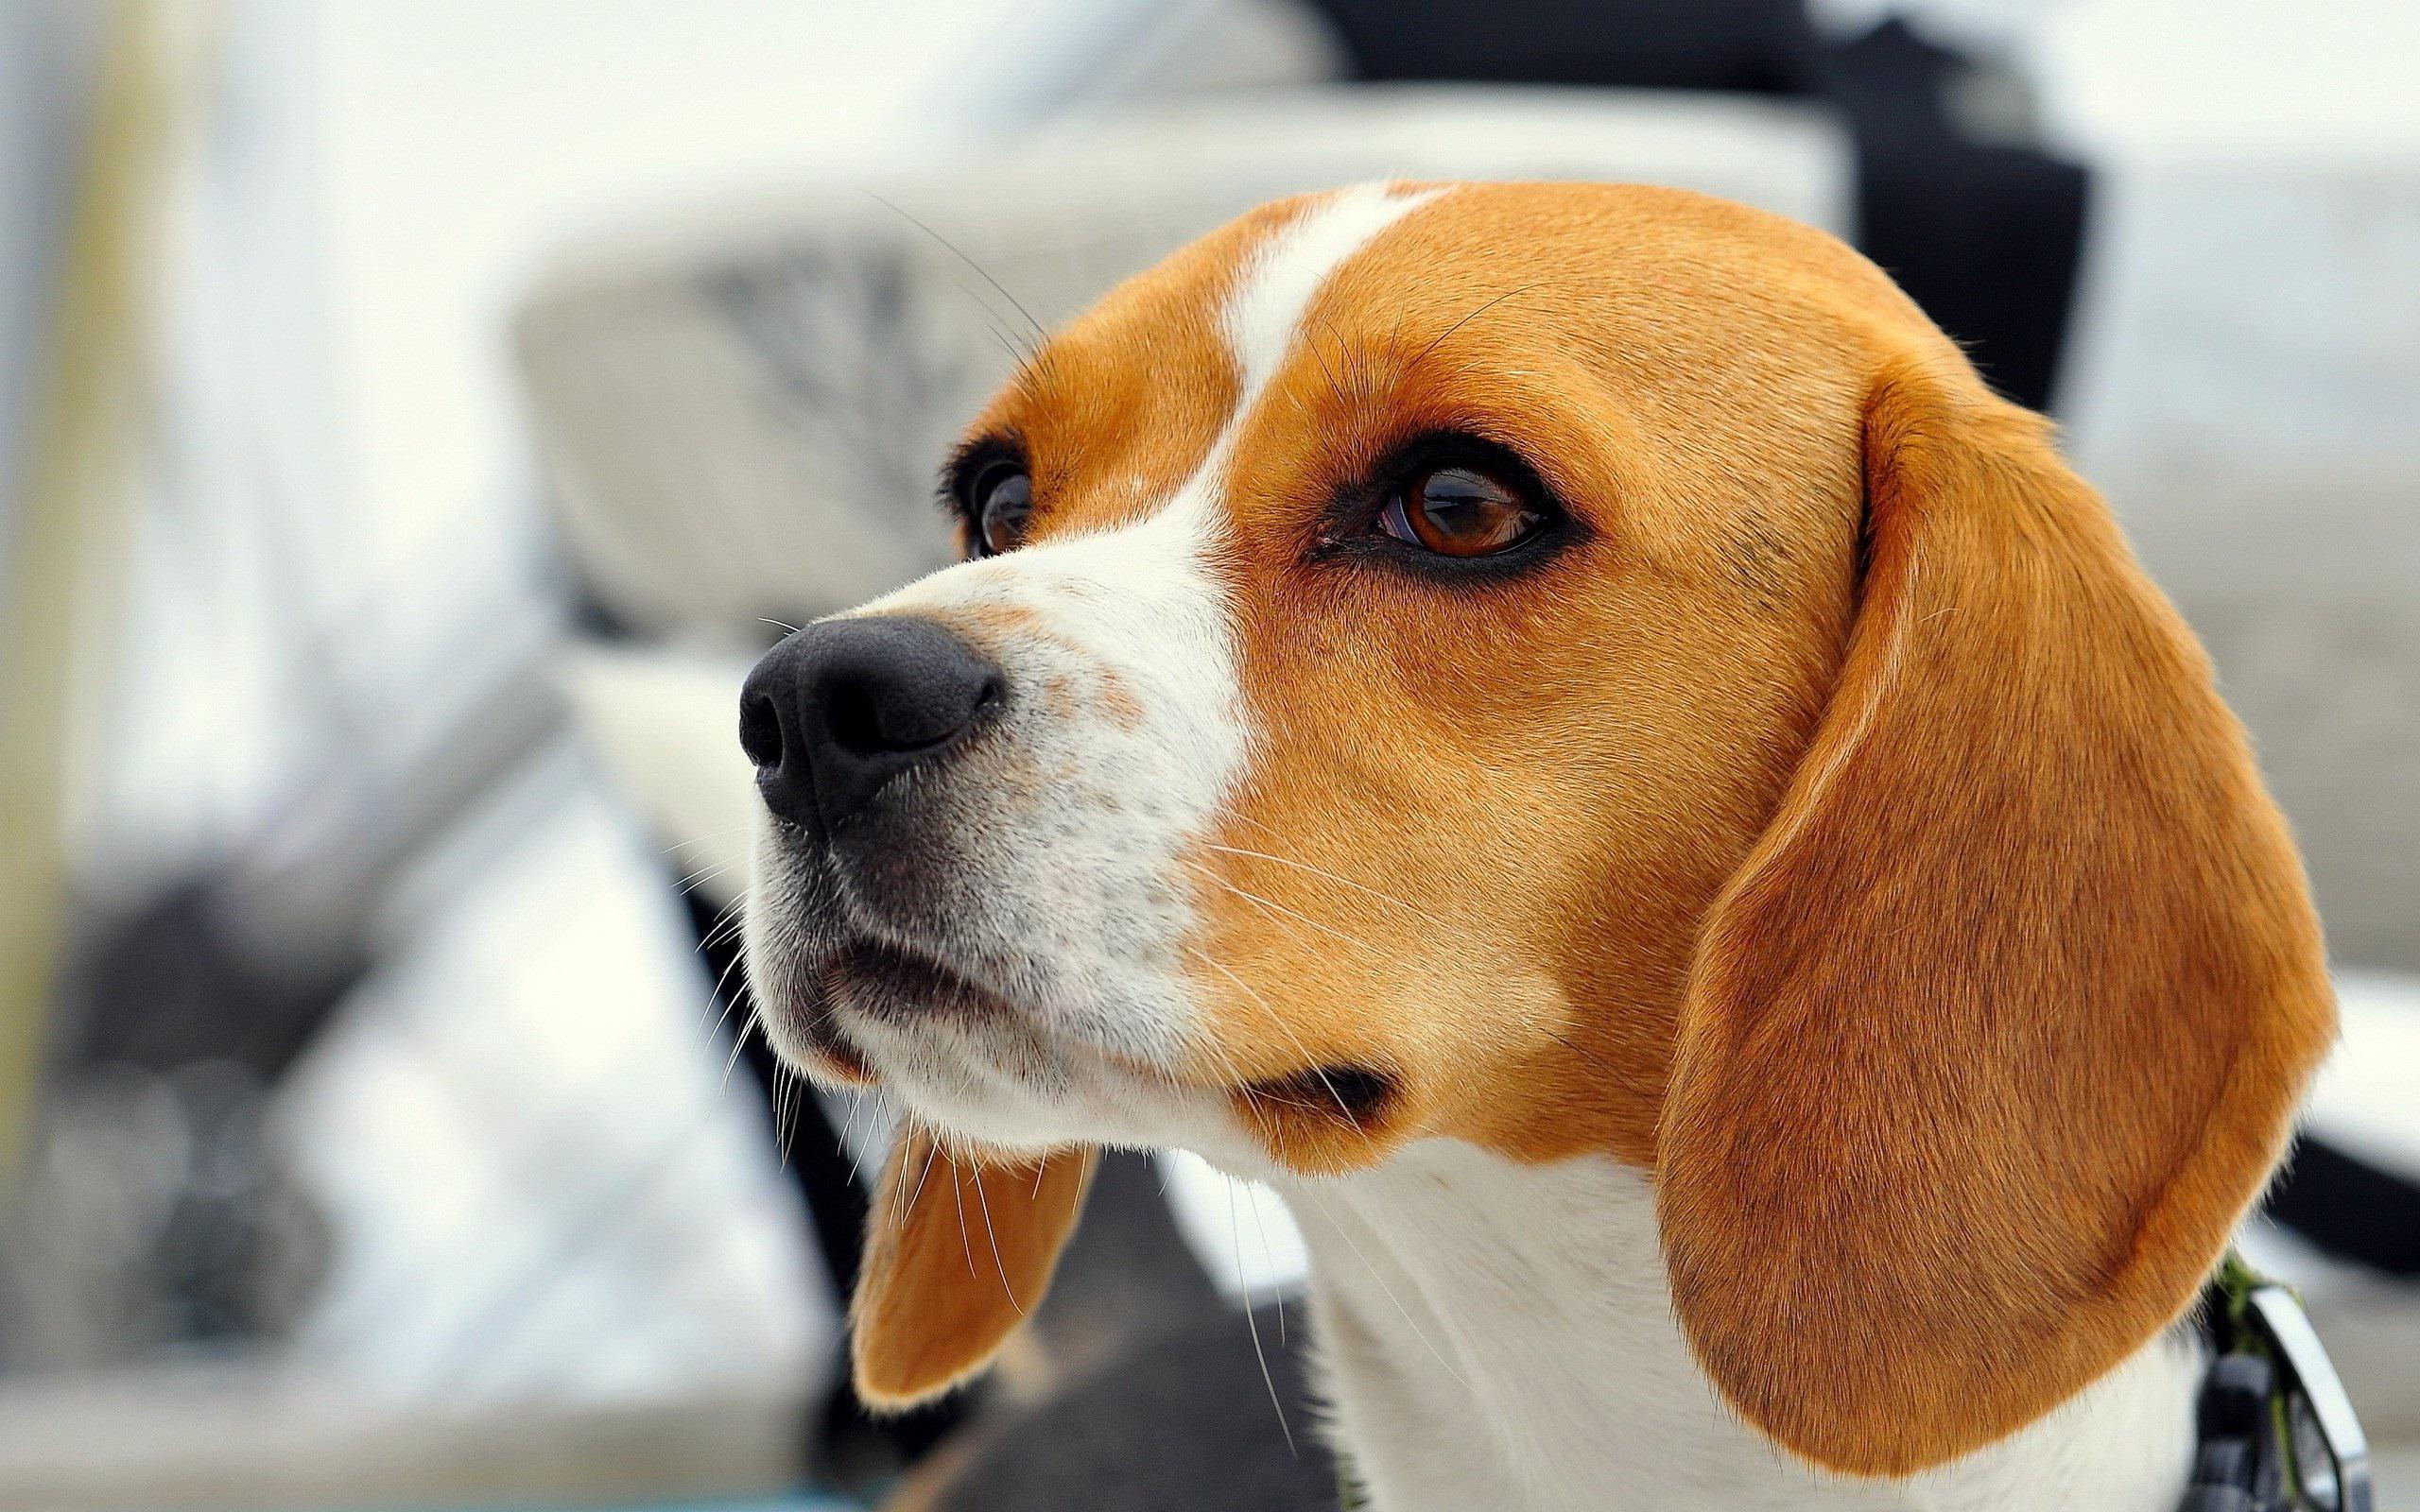 Small Toy Dog Breeds Pics Of Dog Breeds Police Dog Breeds Dog Breeds ...